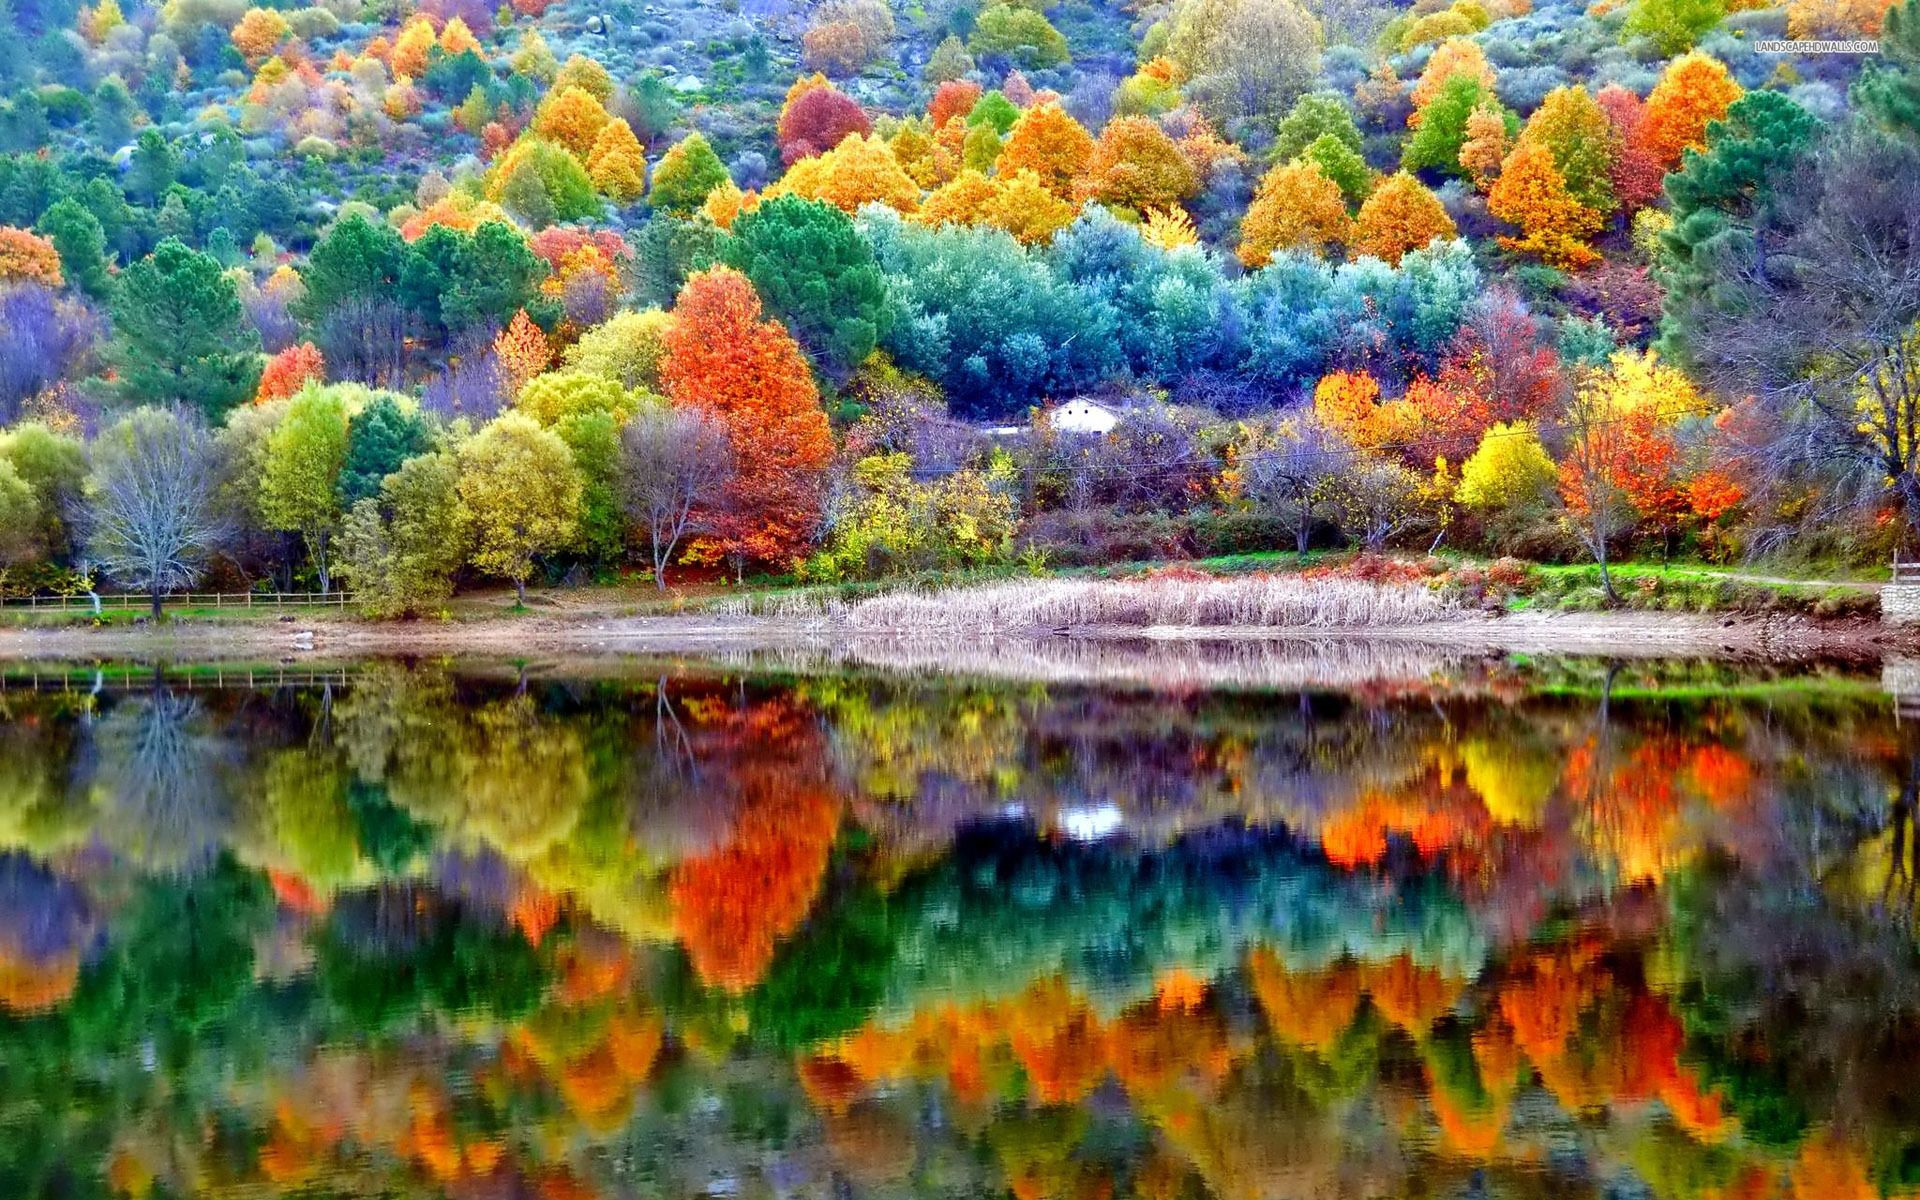 Fall Landscape Wallpaper | Beautiful autumn scenery wallpaper ...